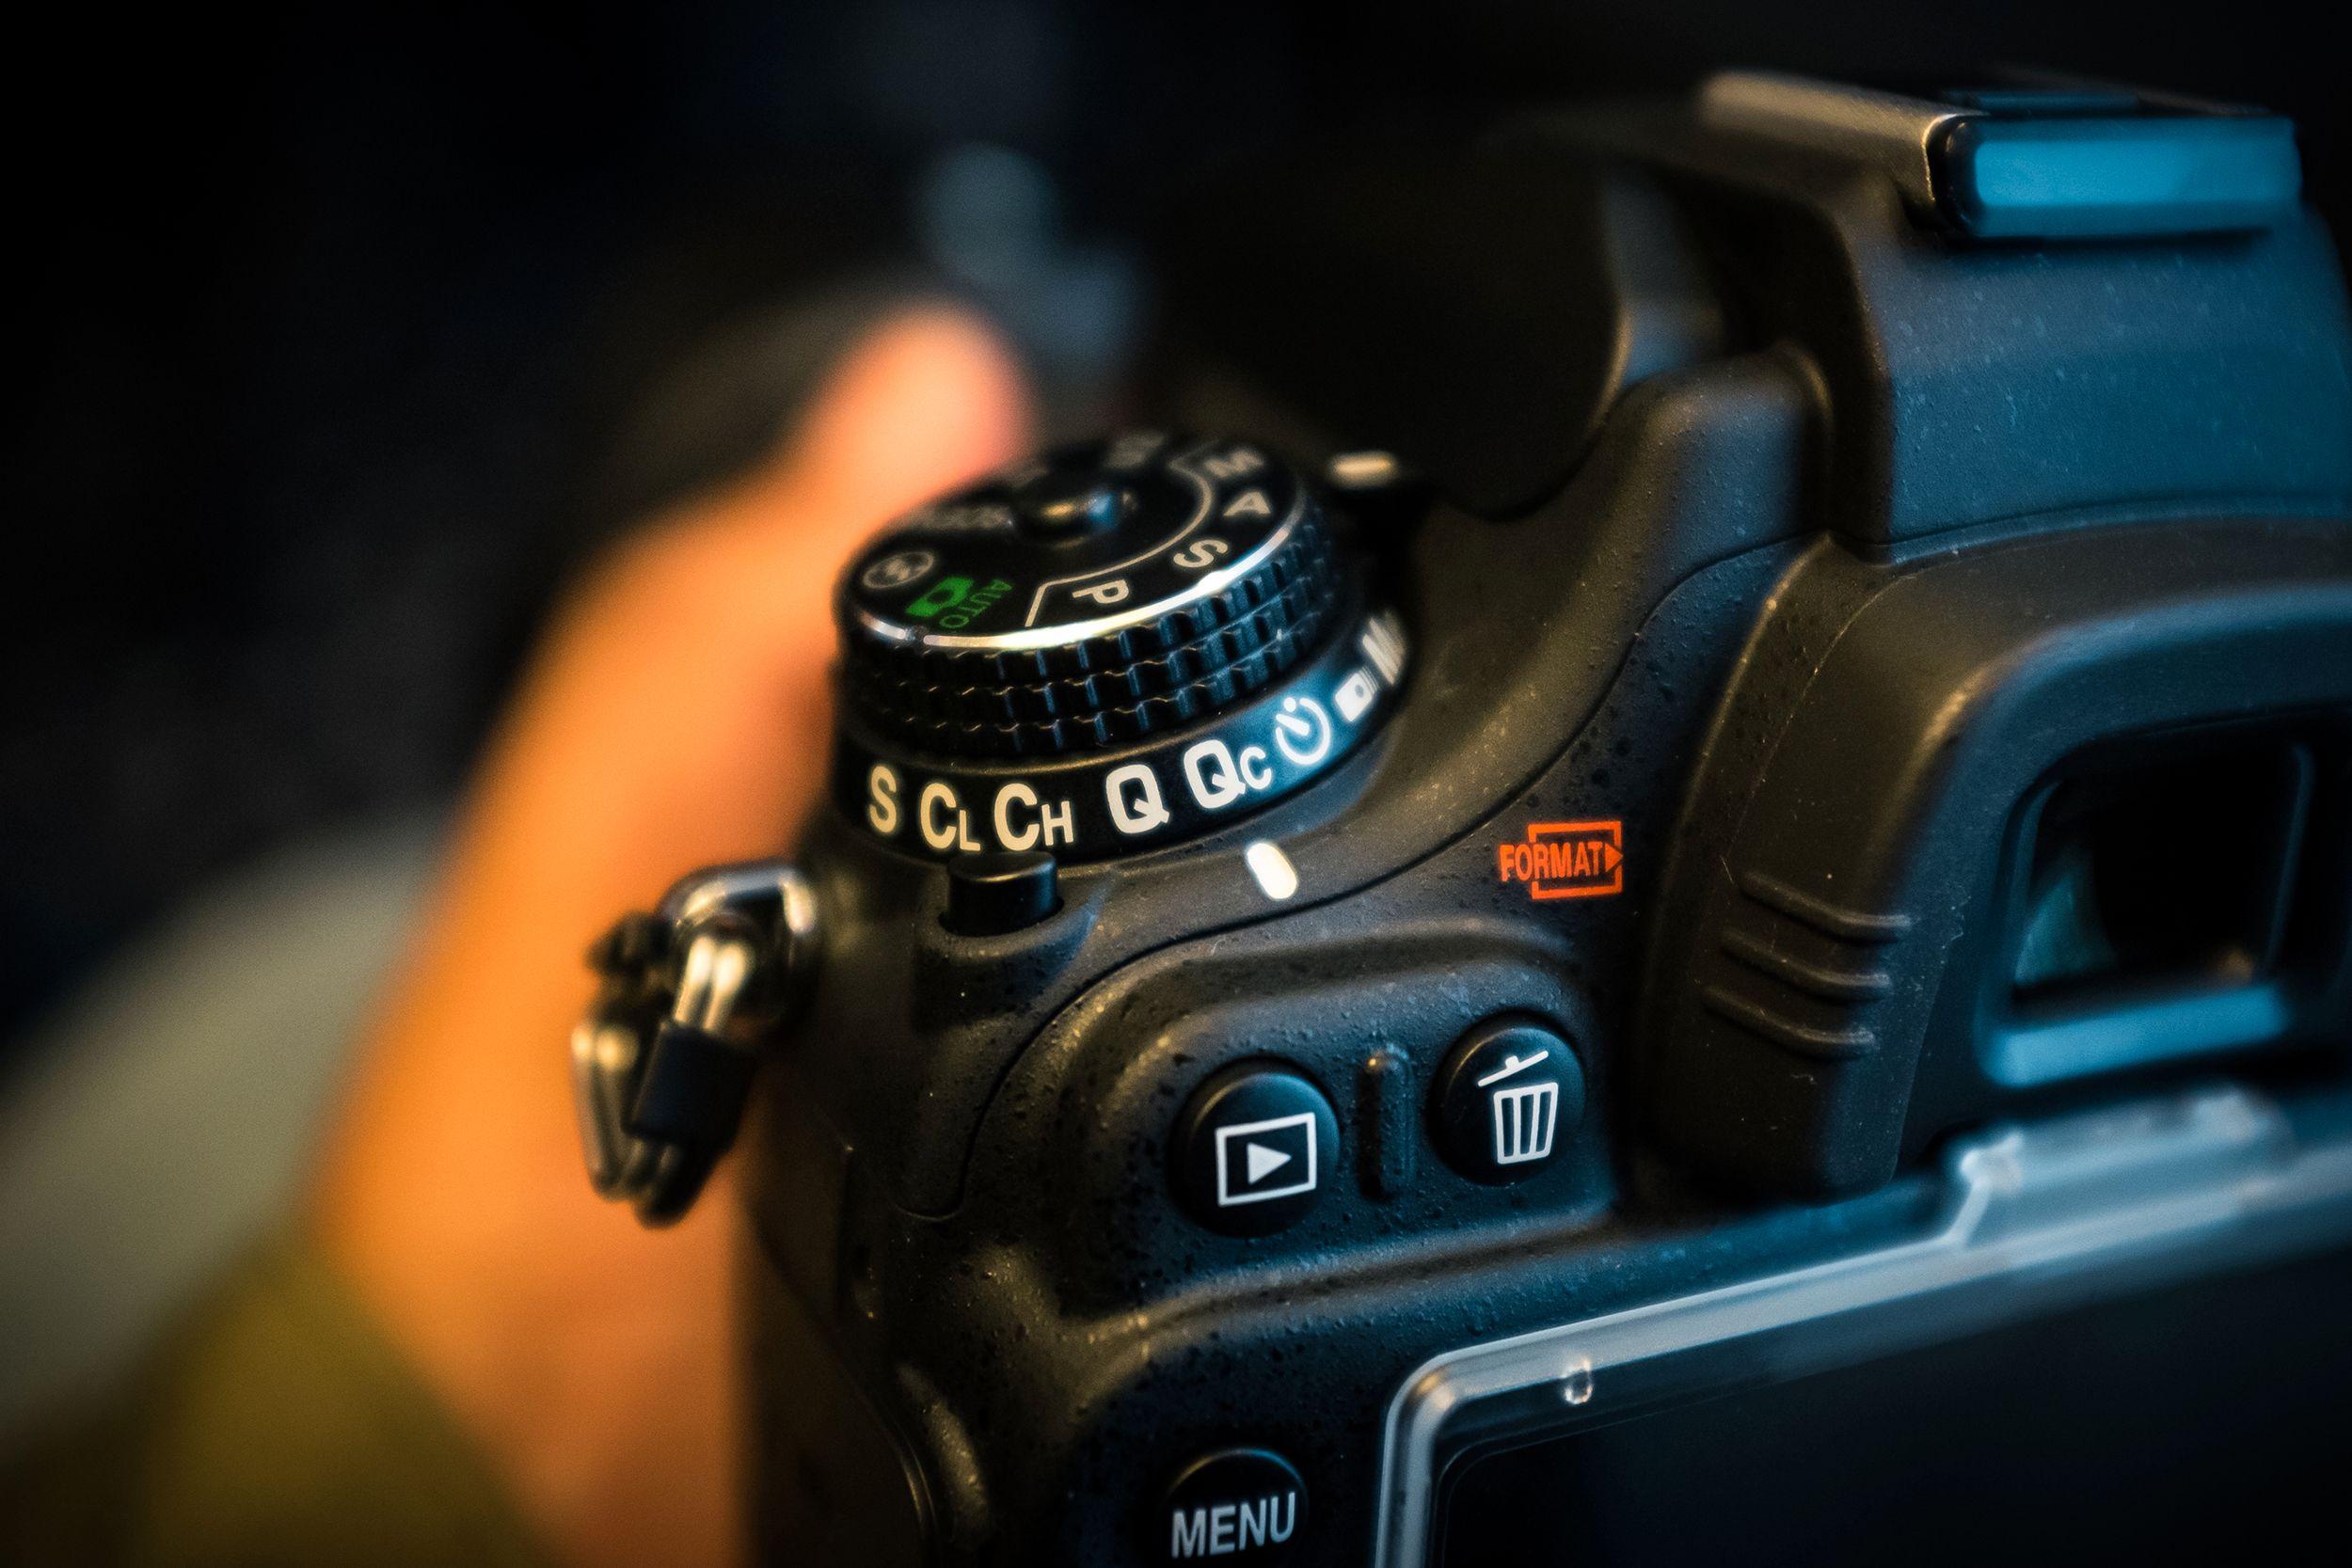 Nikon D610s nye stillemodus heter Qc. Foto: Johannes Granseth